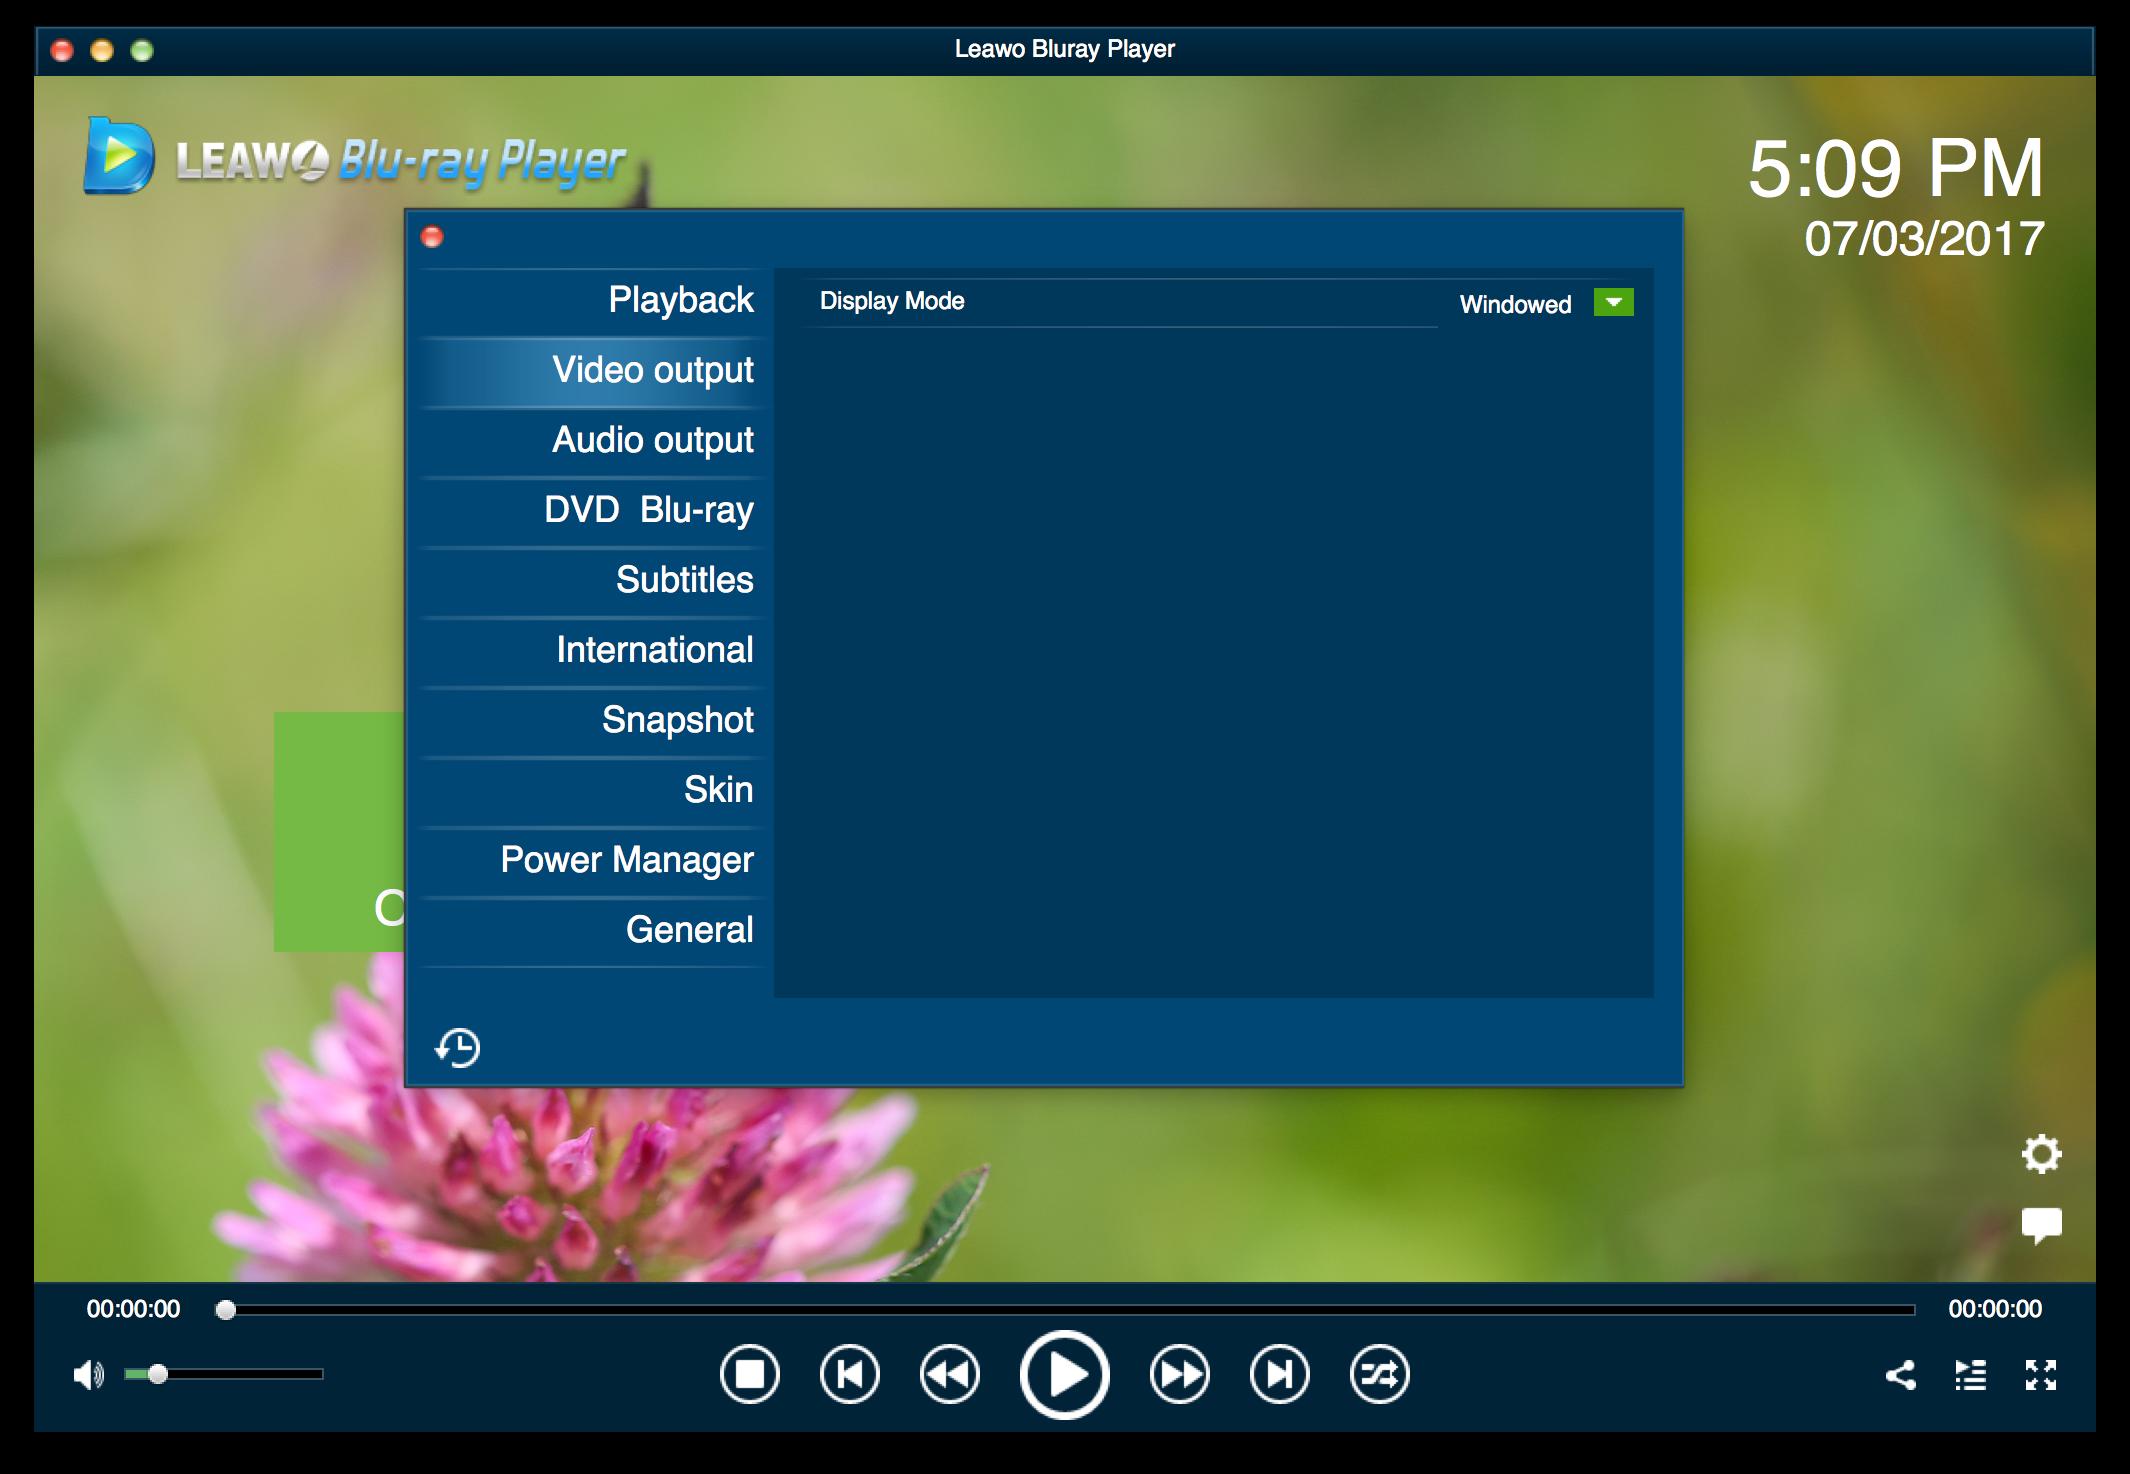 How to Set Leawo Free Blu-ray Player for Mac